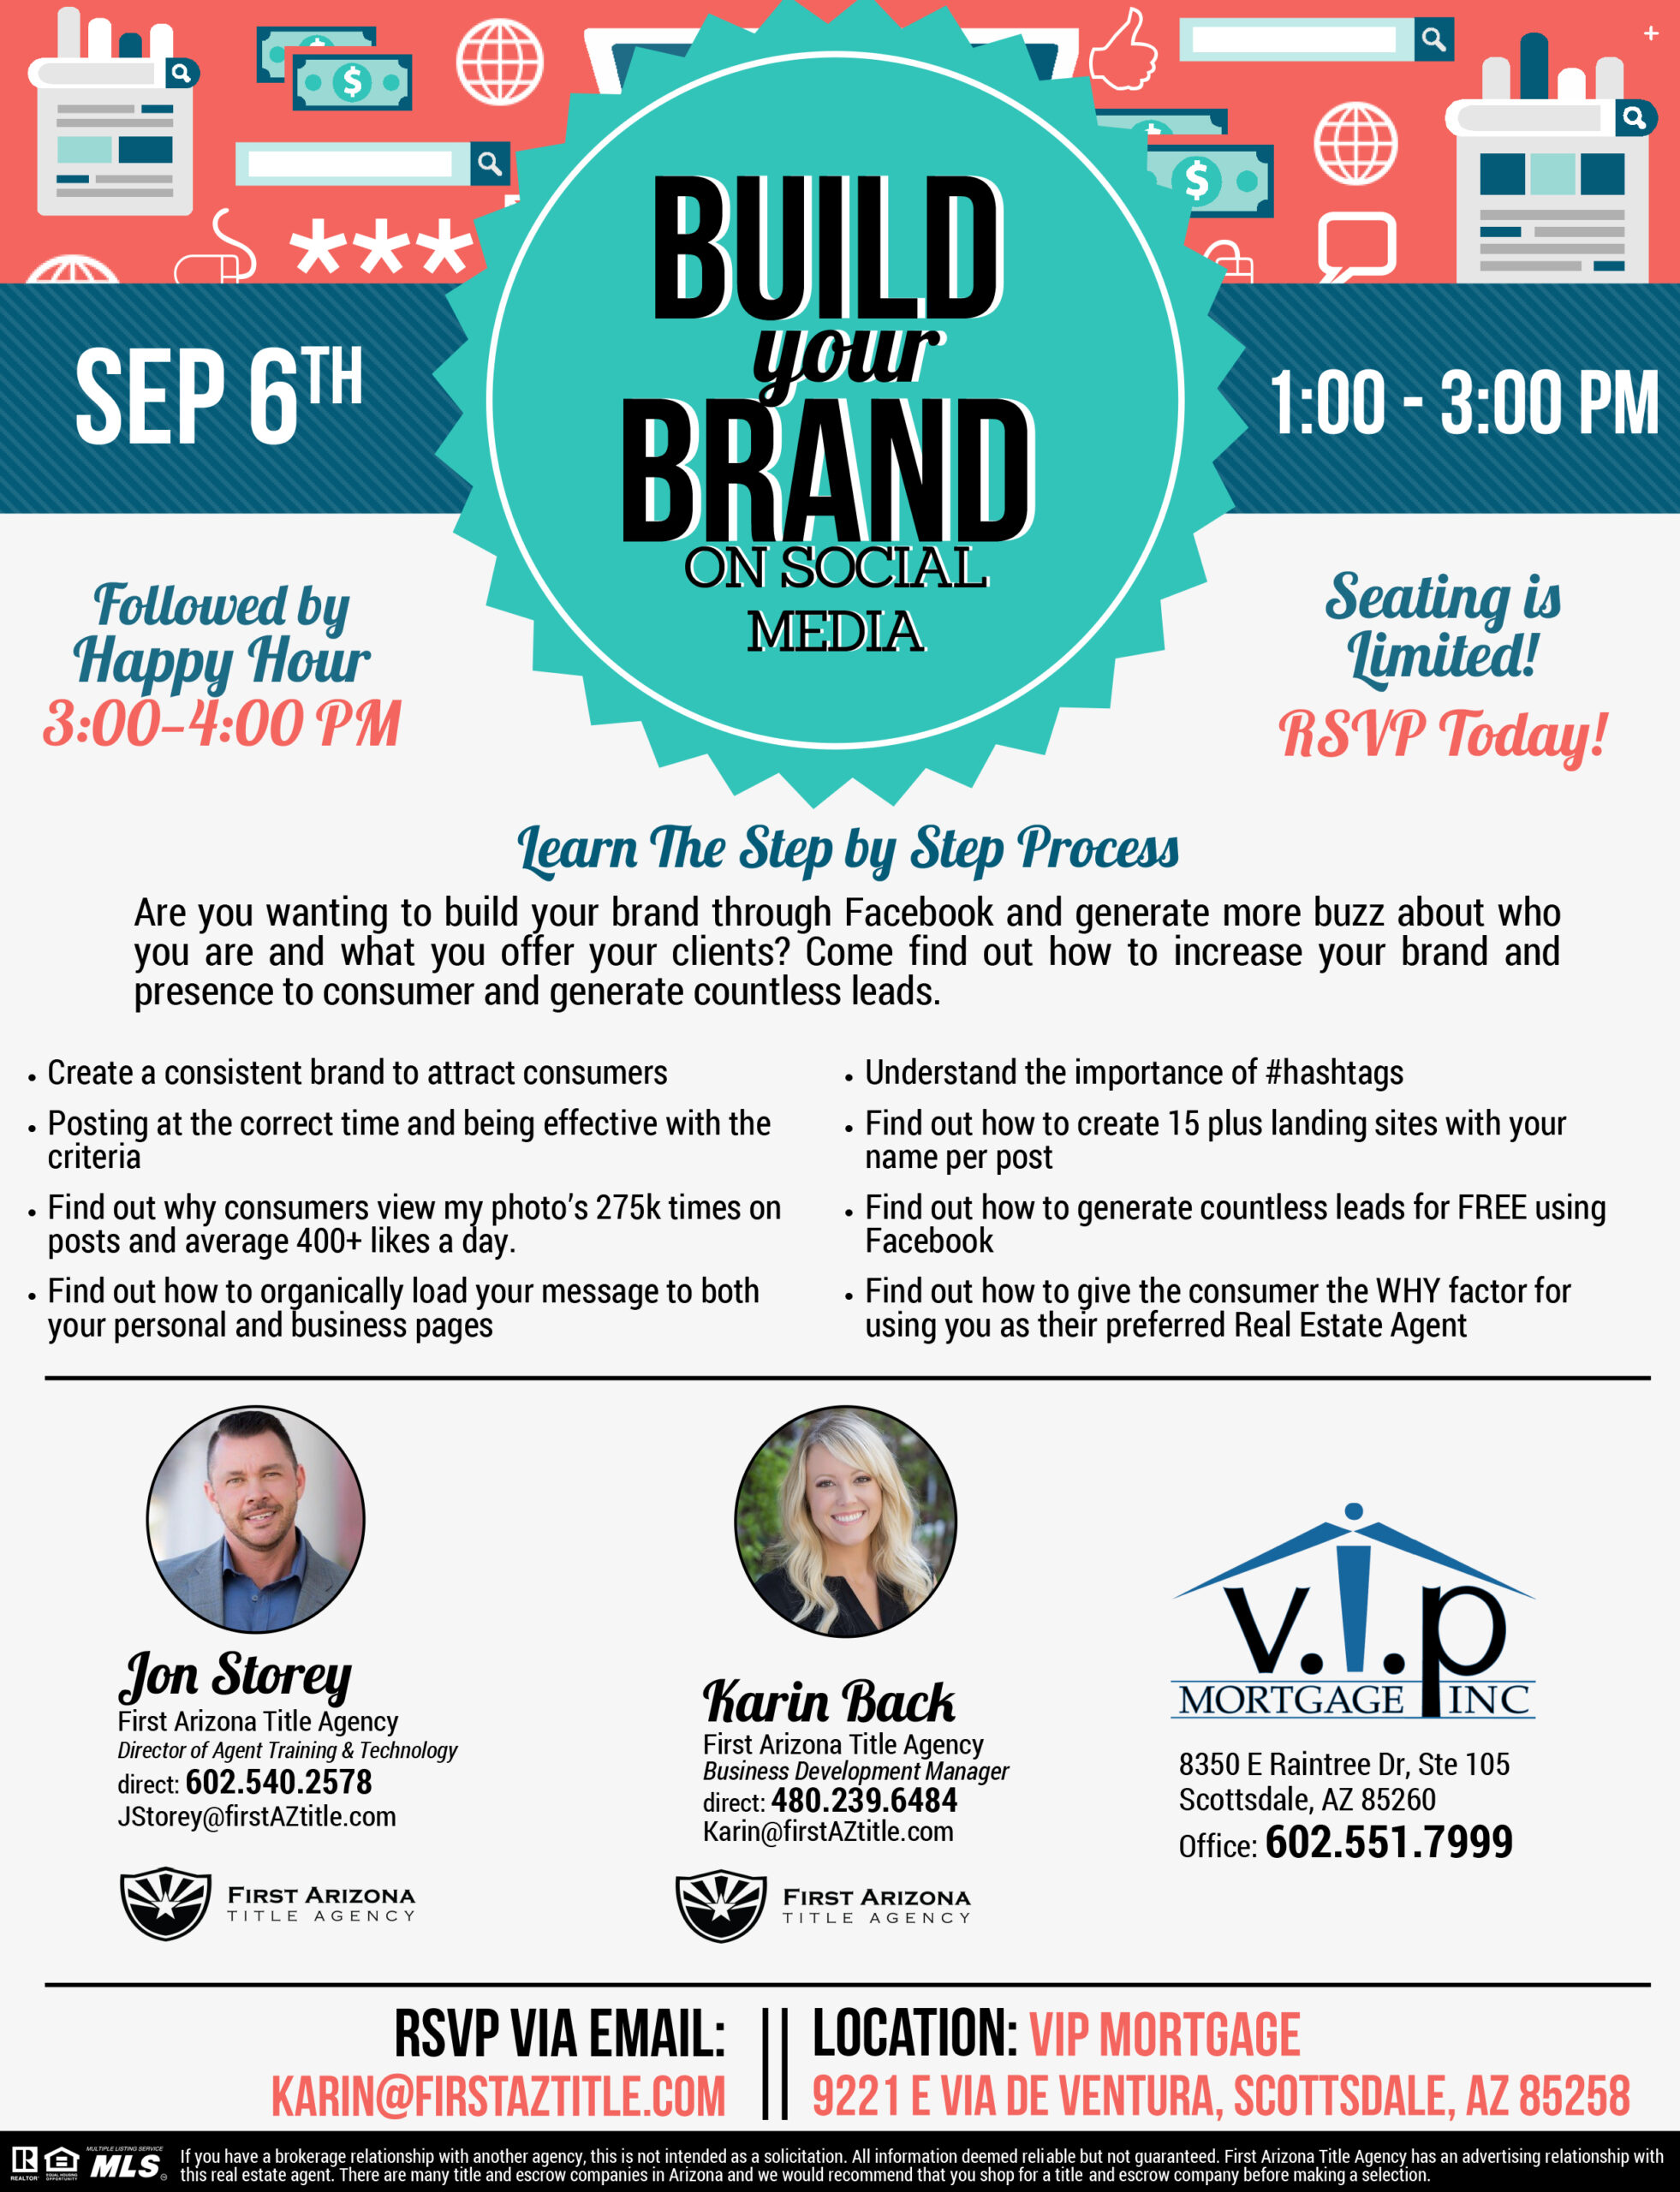 Build your Brand on Social Media @ V.I.P. Mortgage